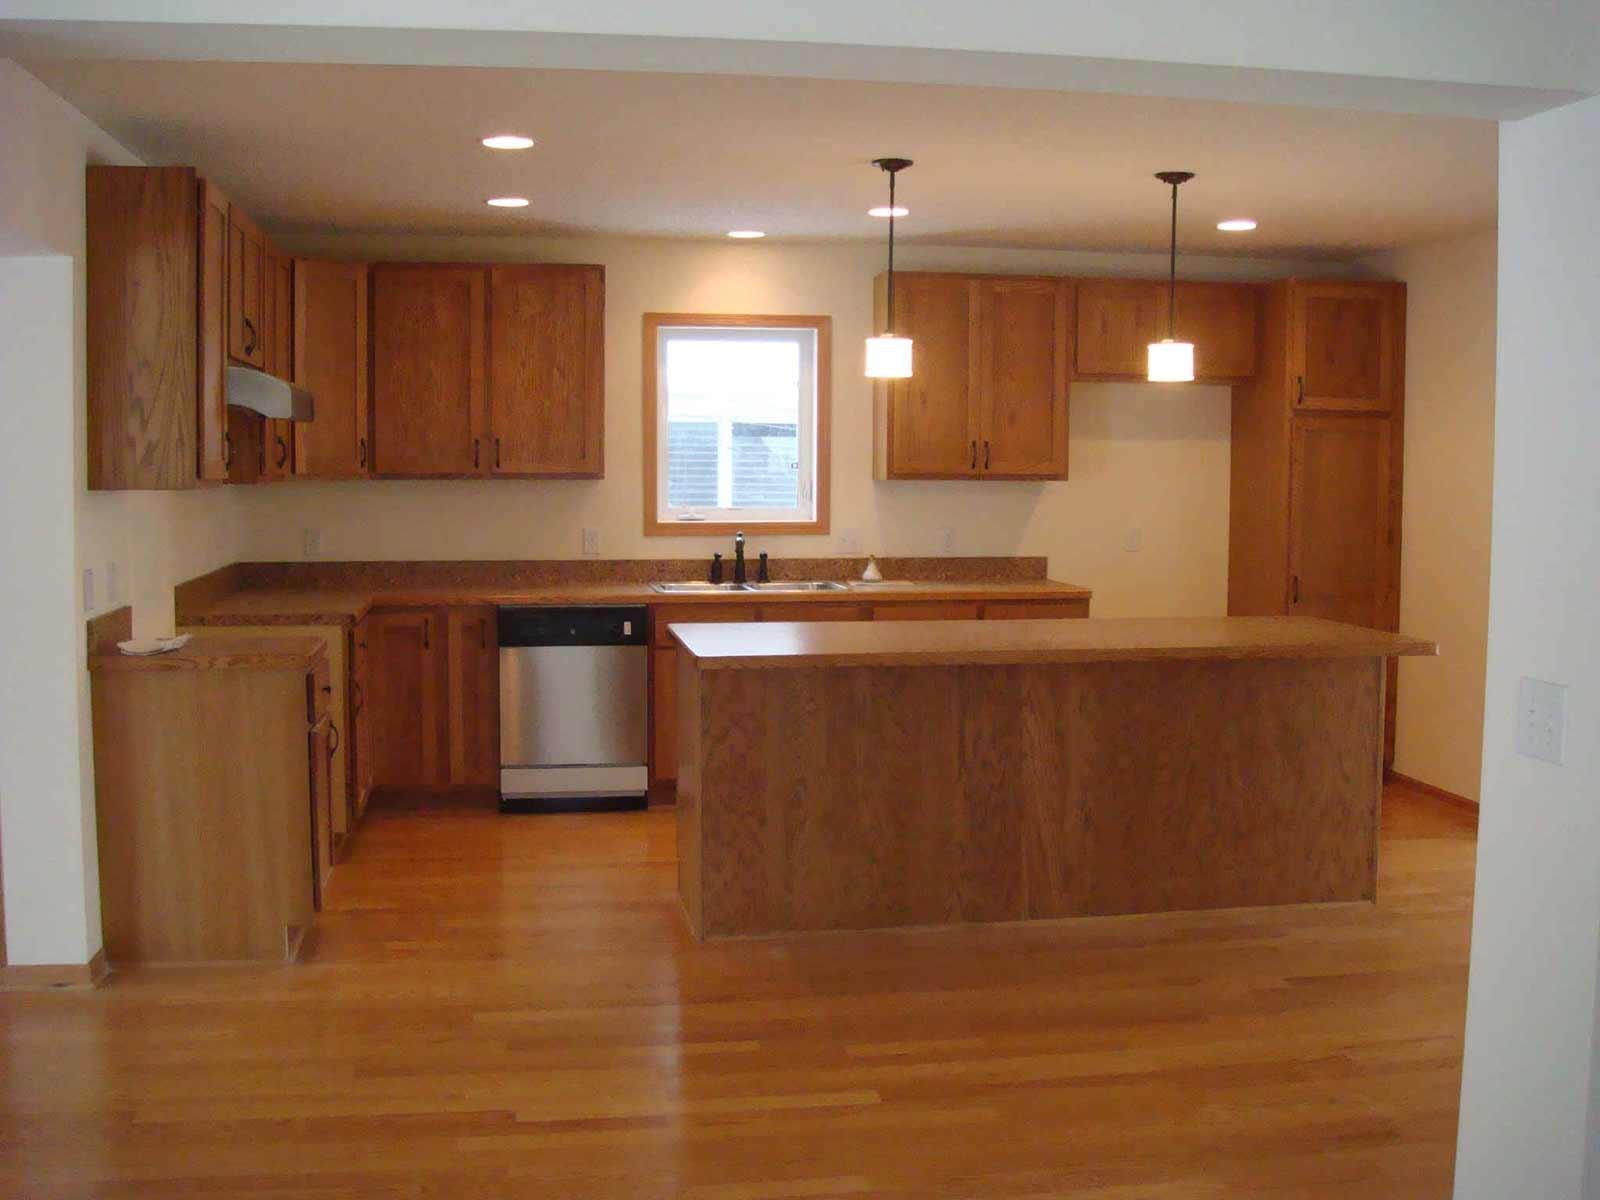 laminate wood flooring for kitchen photo - 10